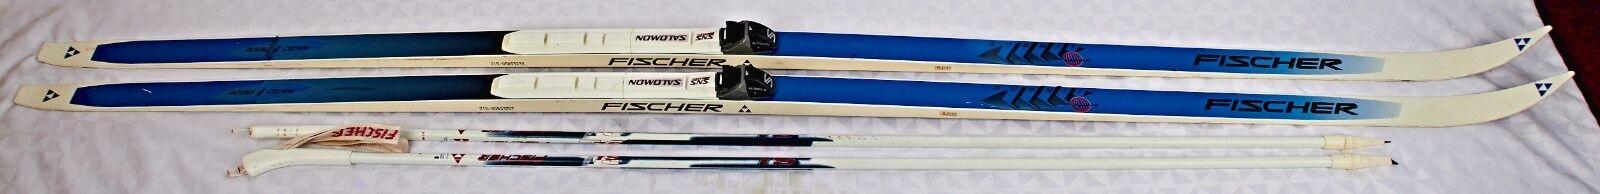 FISCHER Double Crown Skis mit Salomon Prifit Bindings 212 CM w.